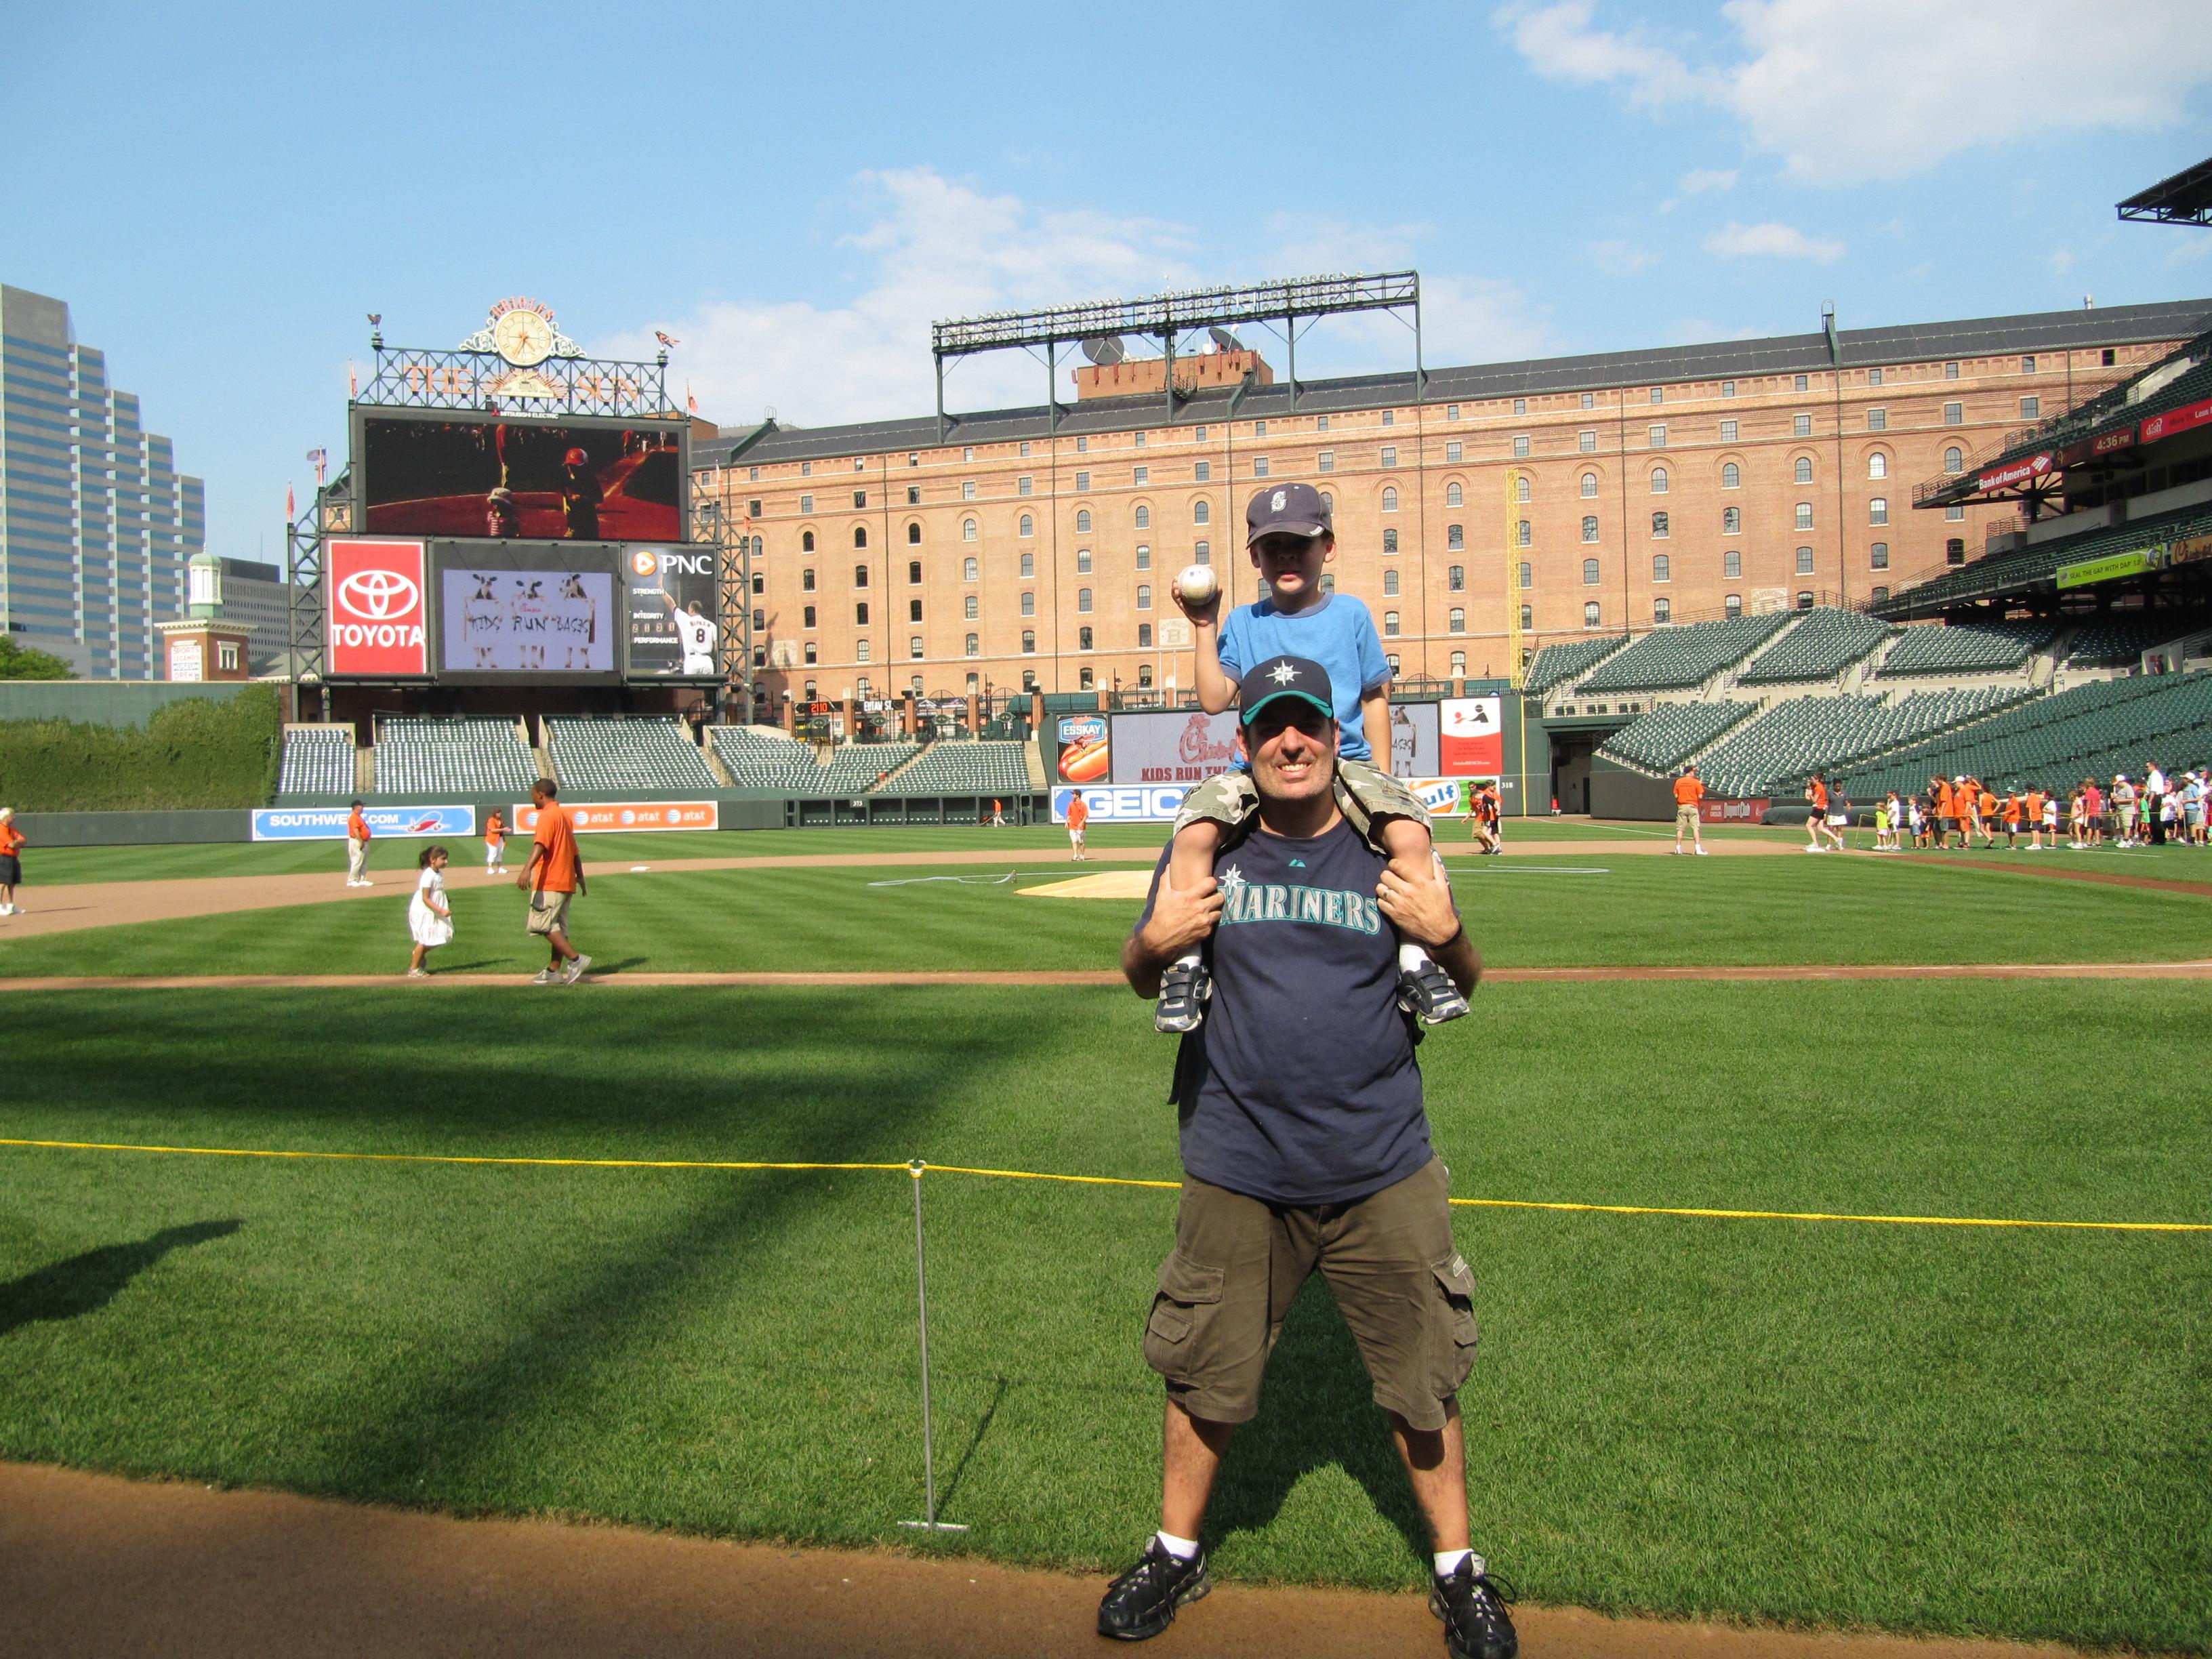 Cook & Sons' Baseball AdventuresTagged: Paul KonerkoCamden Yards: Infield, Outfield & AllAround